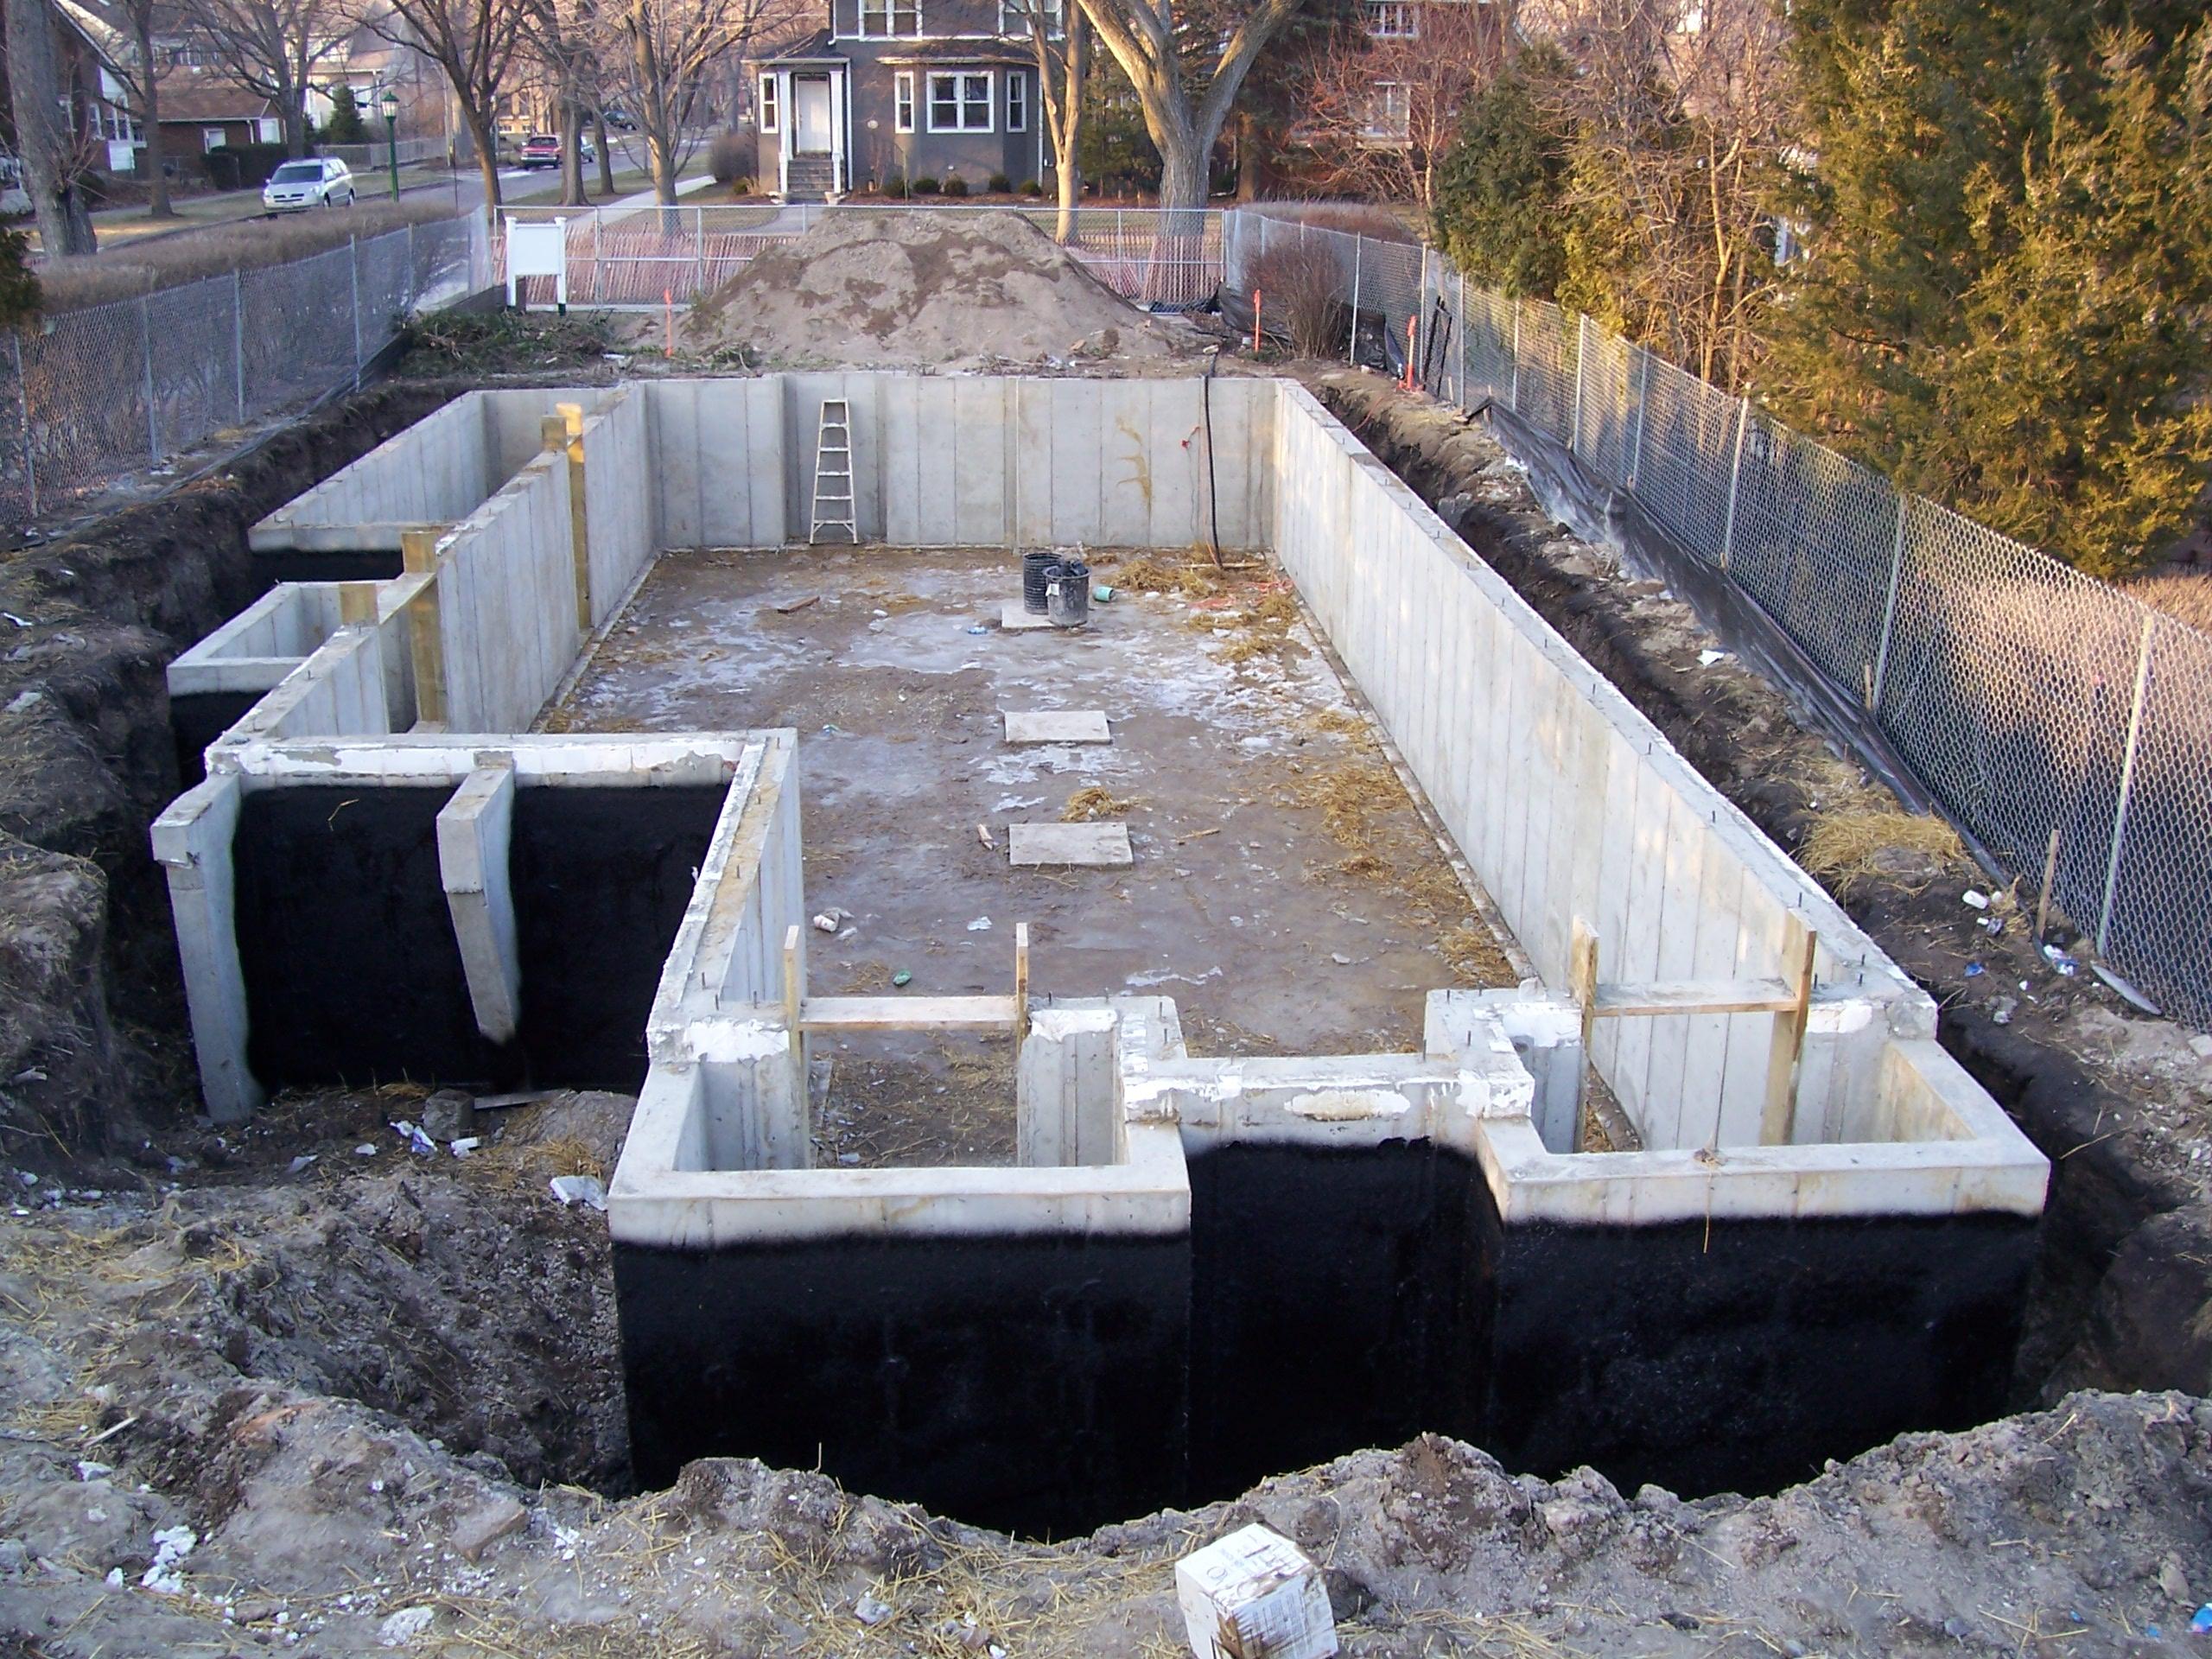 Asphalt concrete construction demolition excavation job for New home foundation